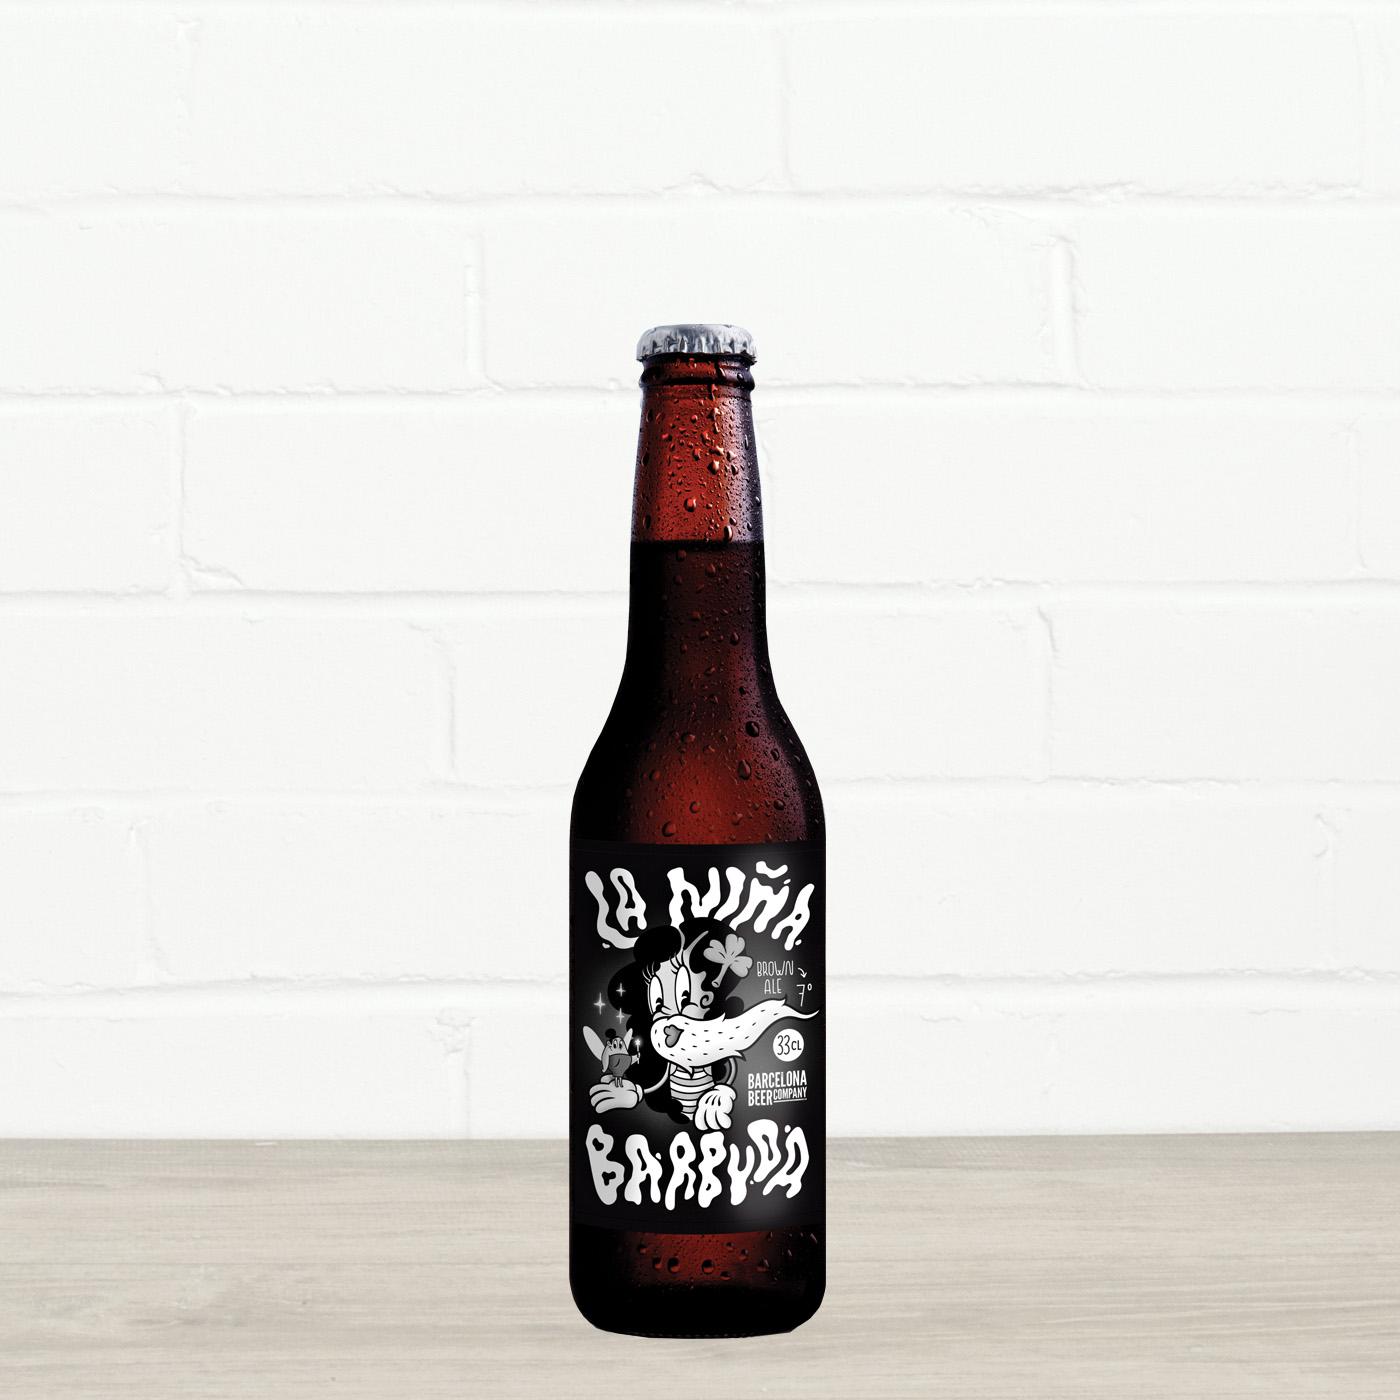 Li Niña Barbuda by Barcelona Beer Company